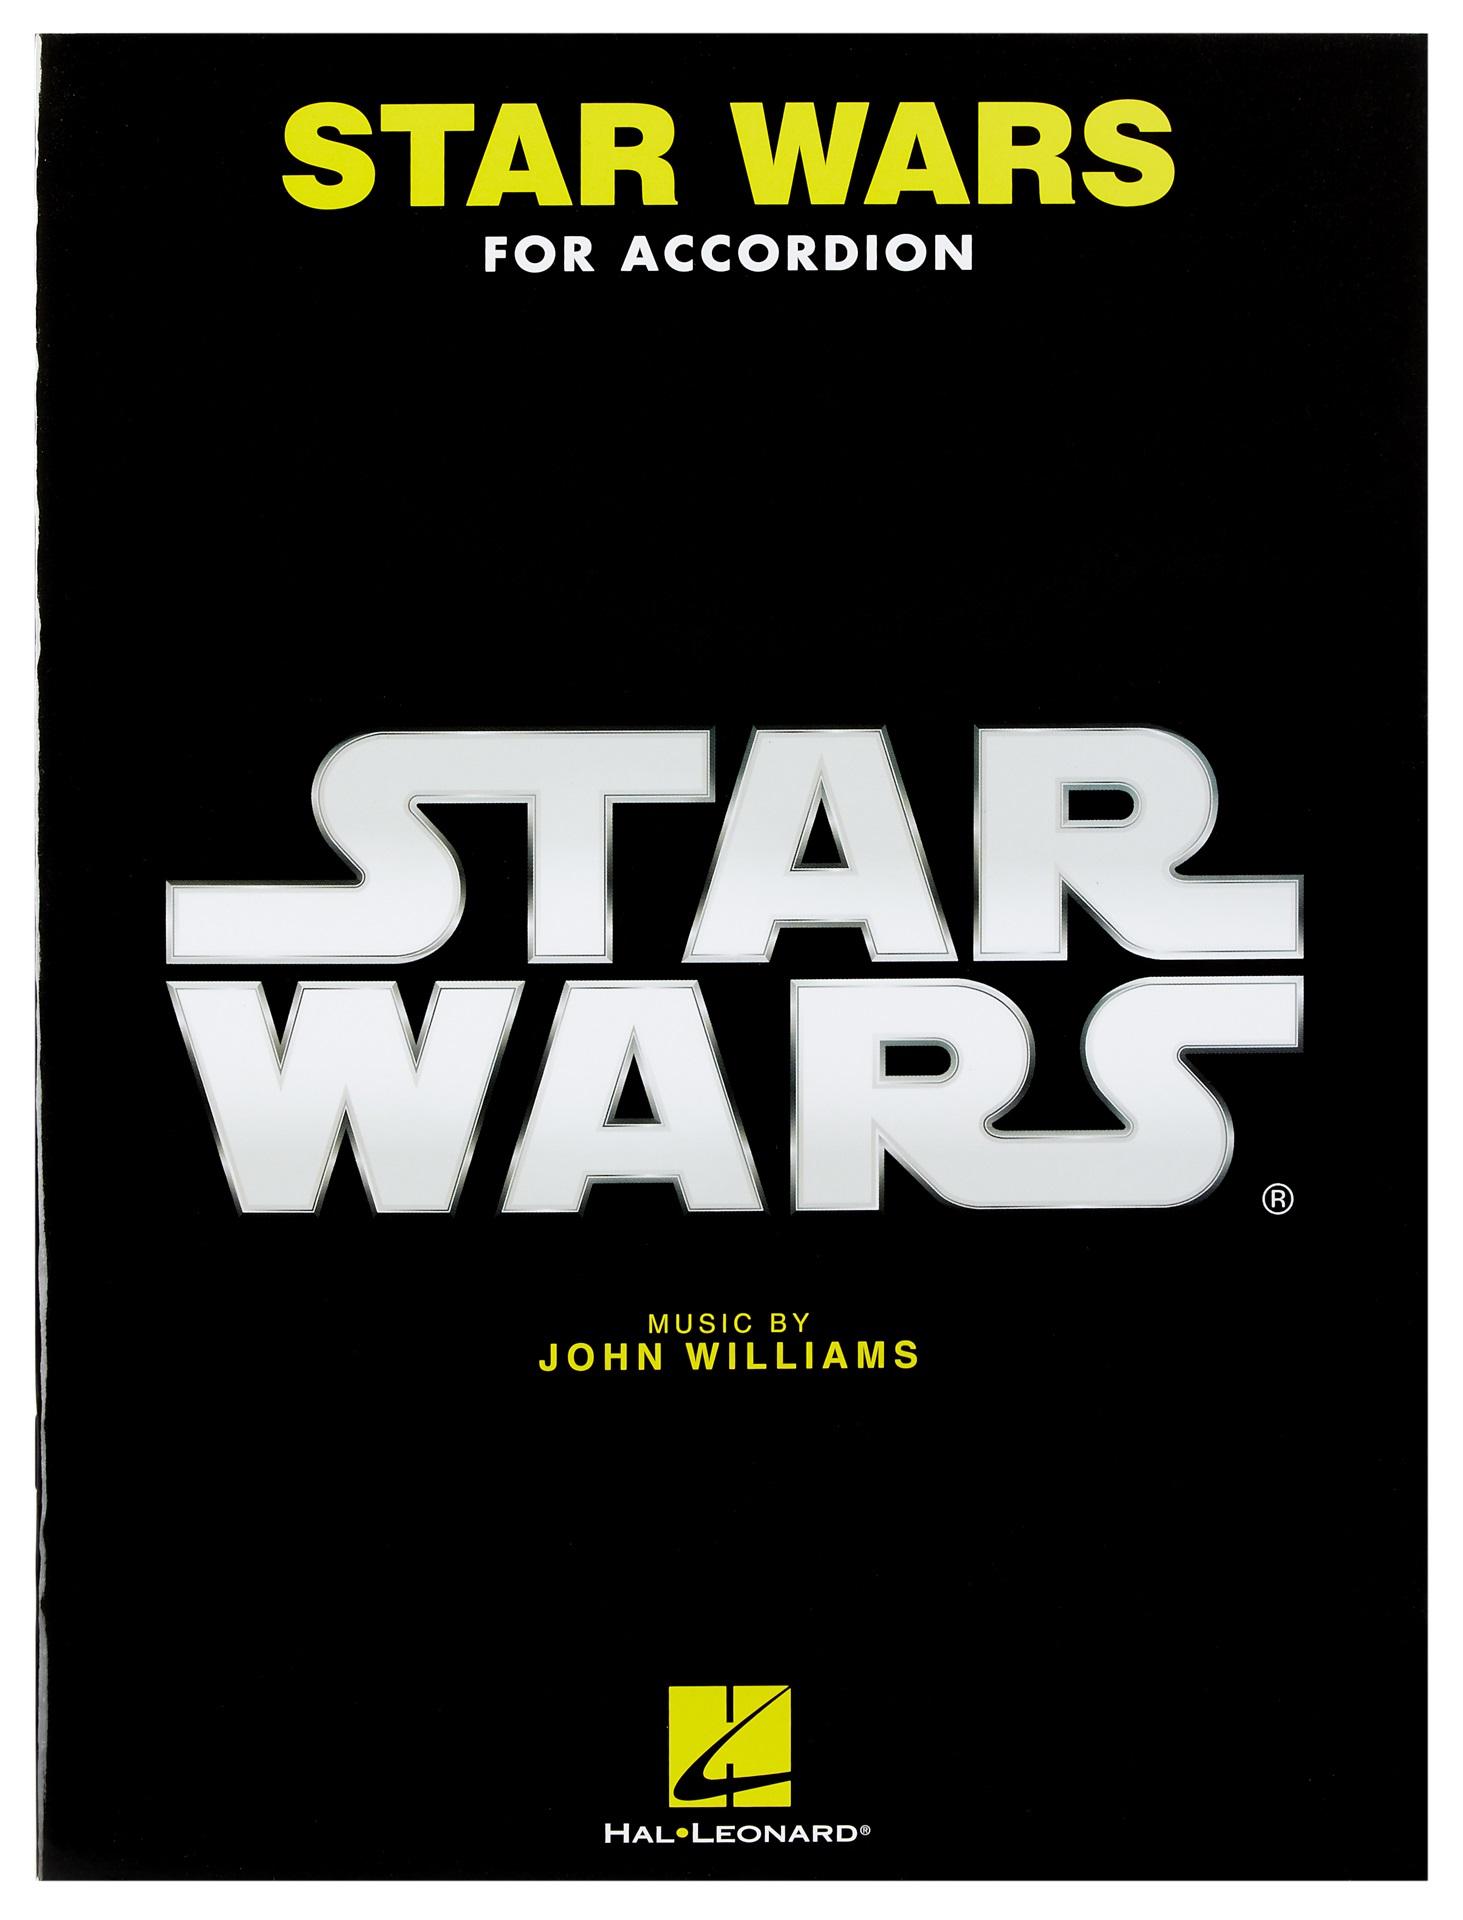 MS John Williams: Star Wars For Accordion